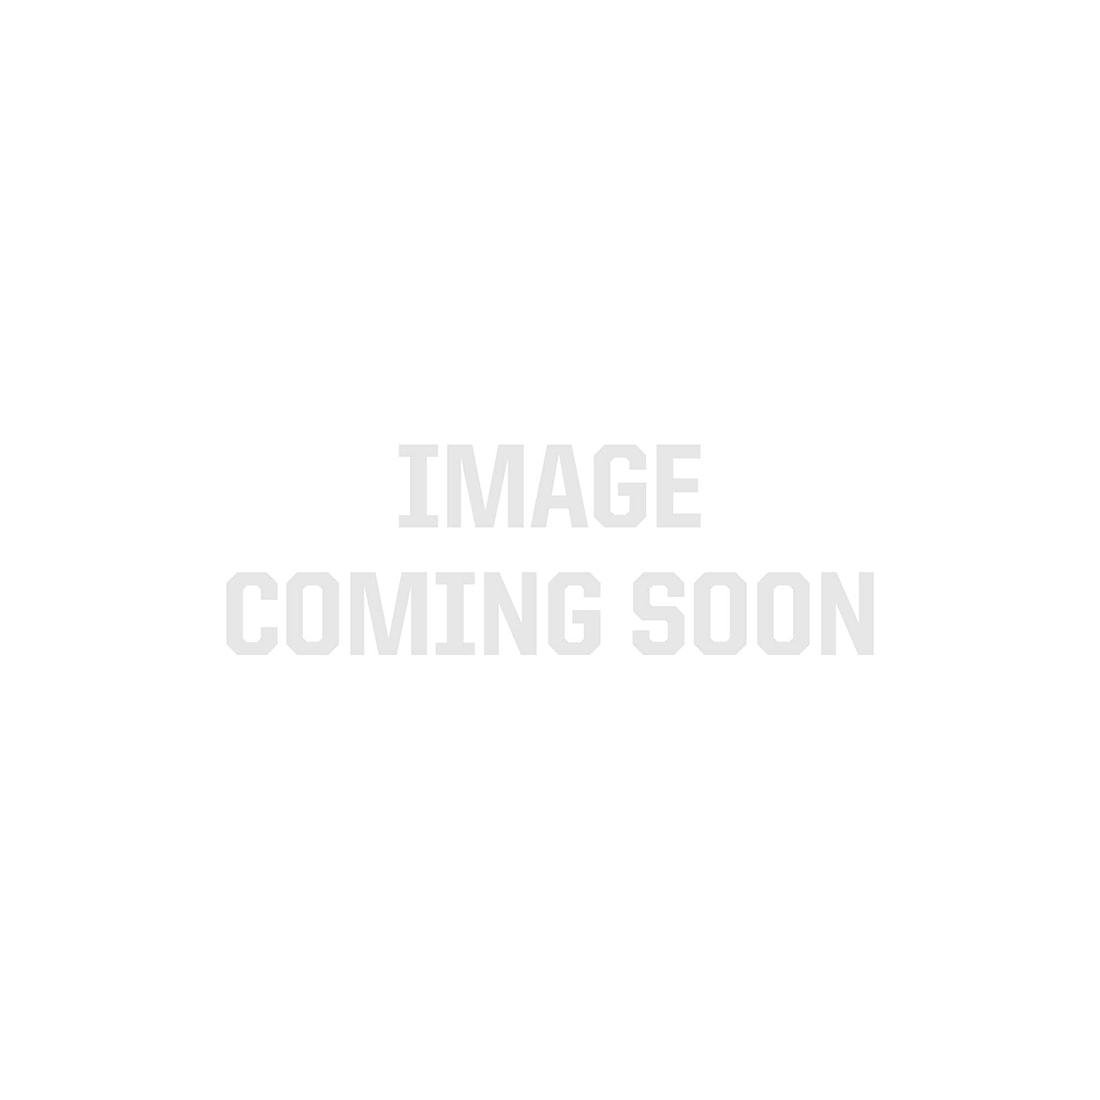 Waterproof Soft White 3528 LED Strip Light, 60/m, 8mm wide, Sample Kit